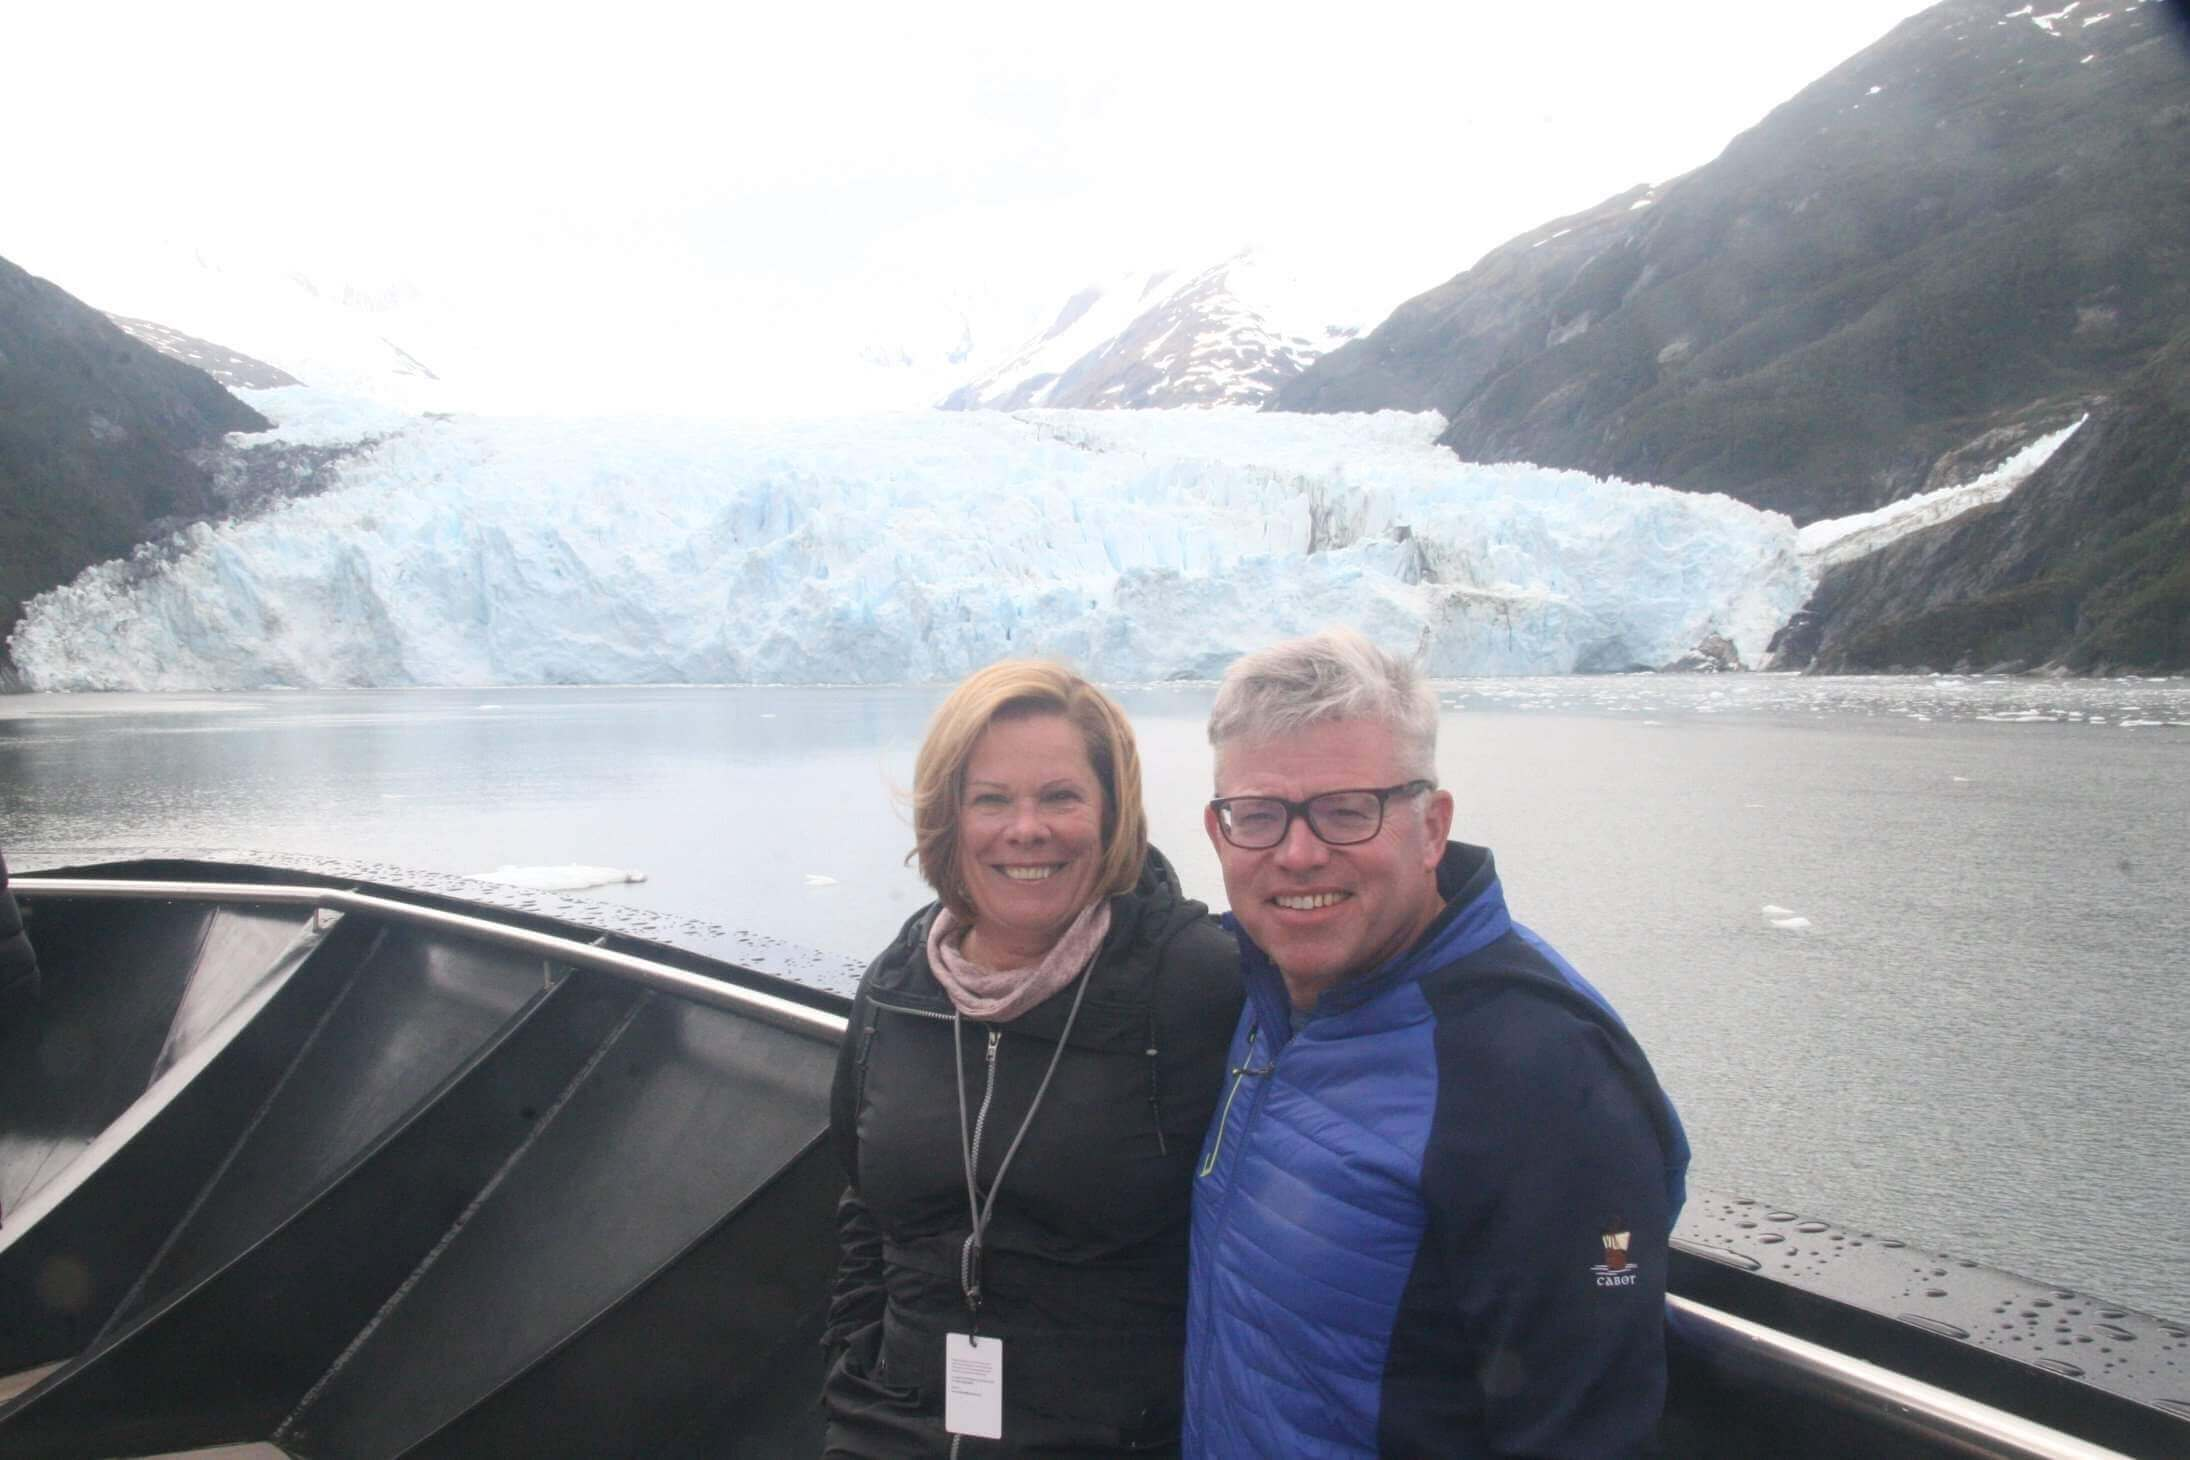 Steve Holmes with wife Cheryl